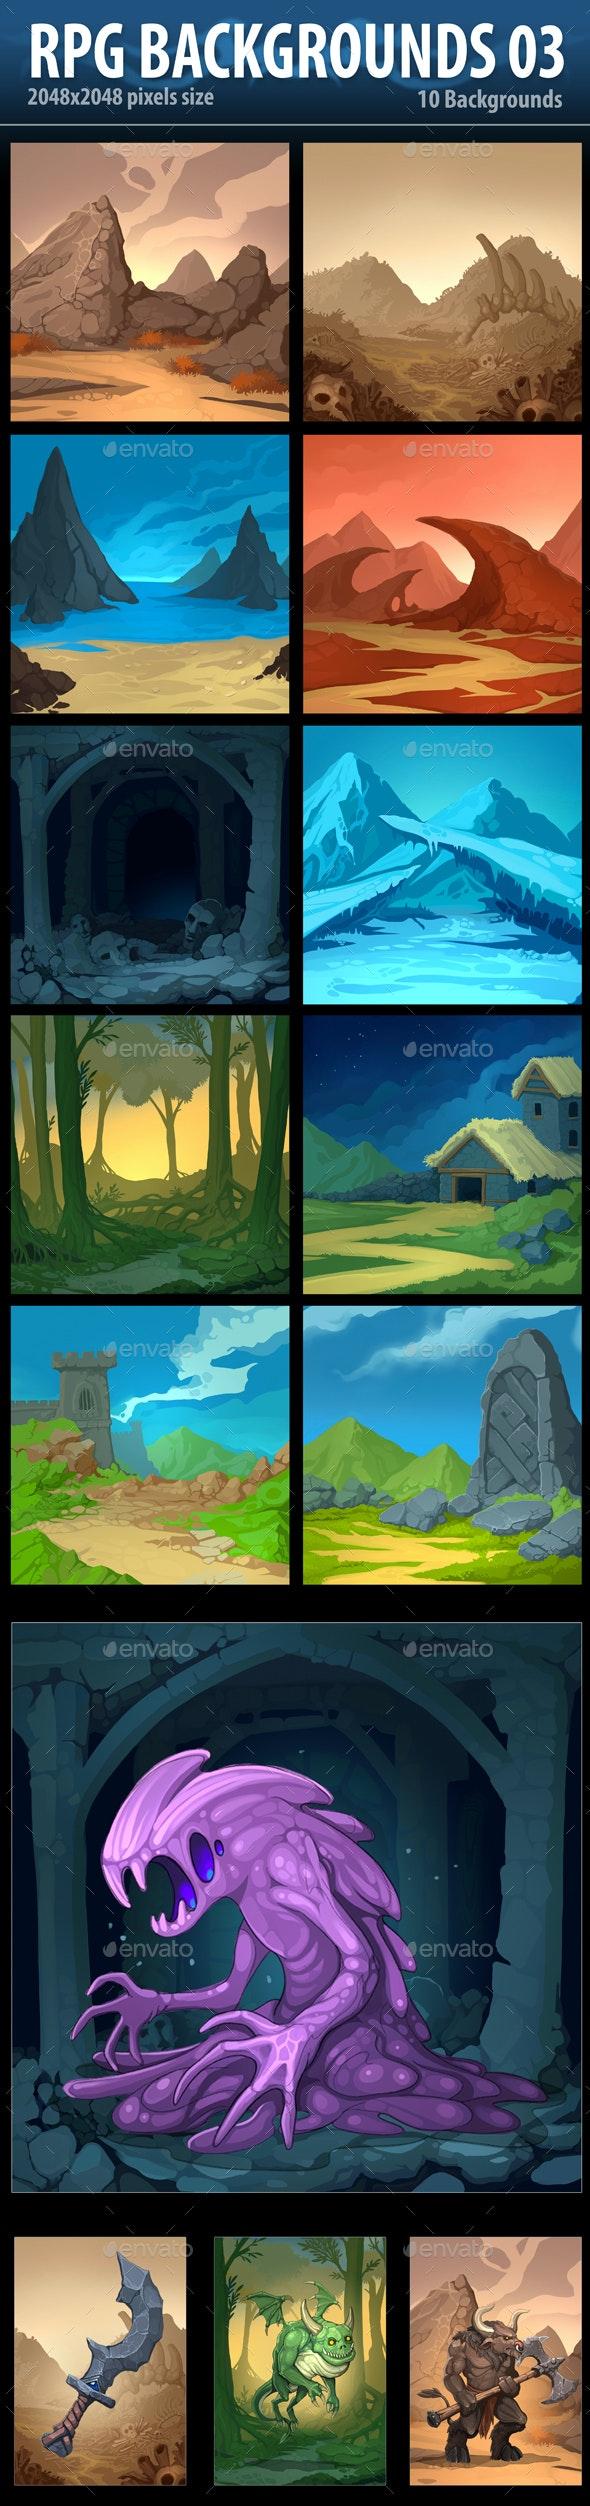 RPG Backgrounds 03 - Backgrounds Game Assets